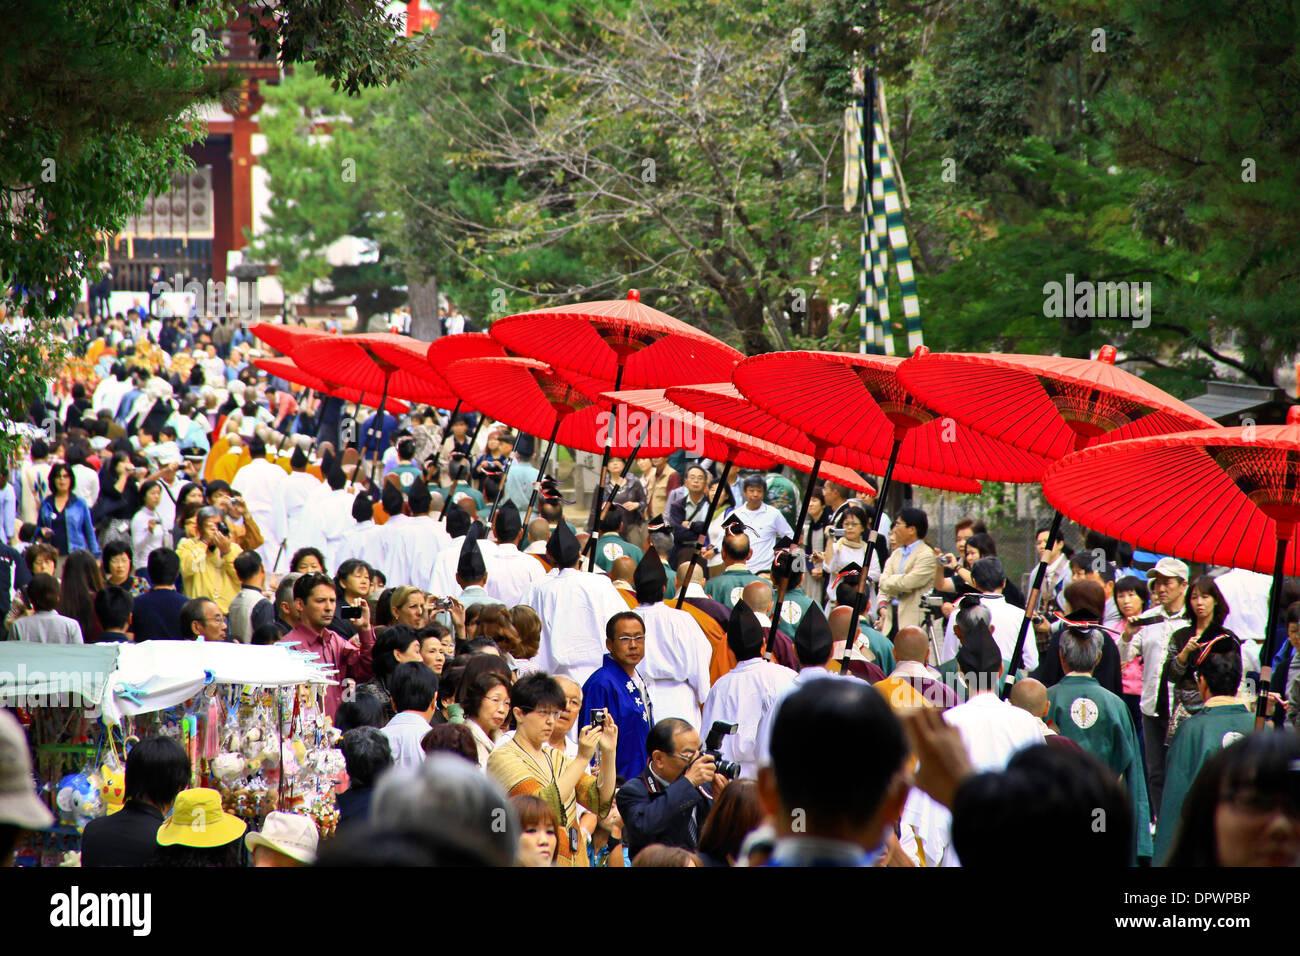 Bright red parasols carried at a Buddhist procession, at Todaiji Temple, Nara - Japan. - Stock Image